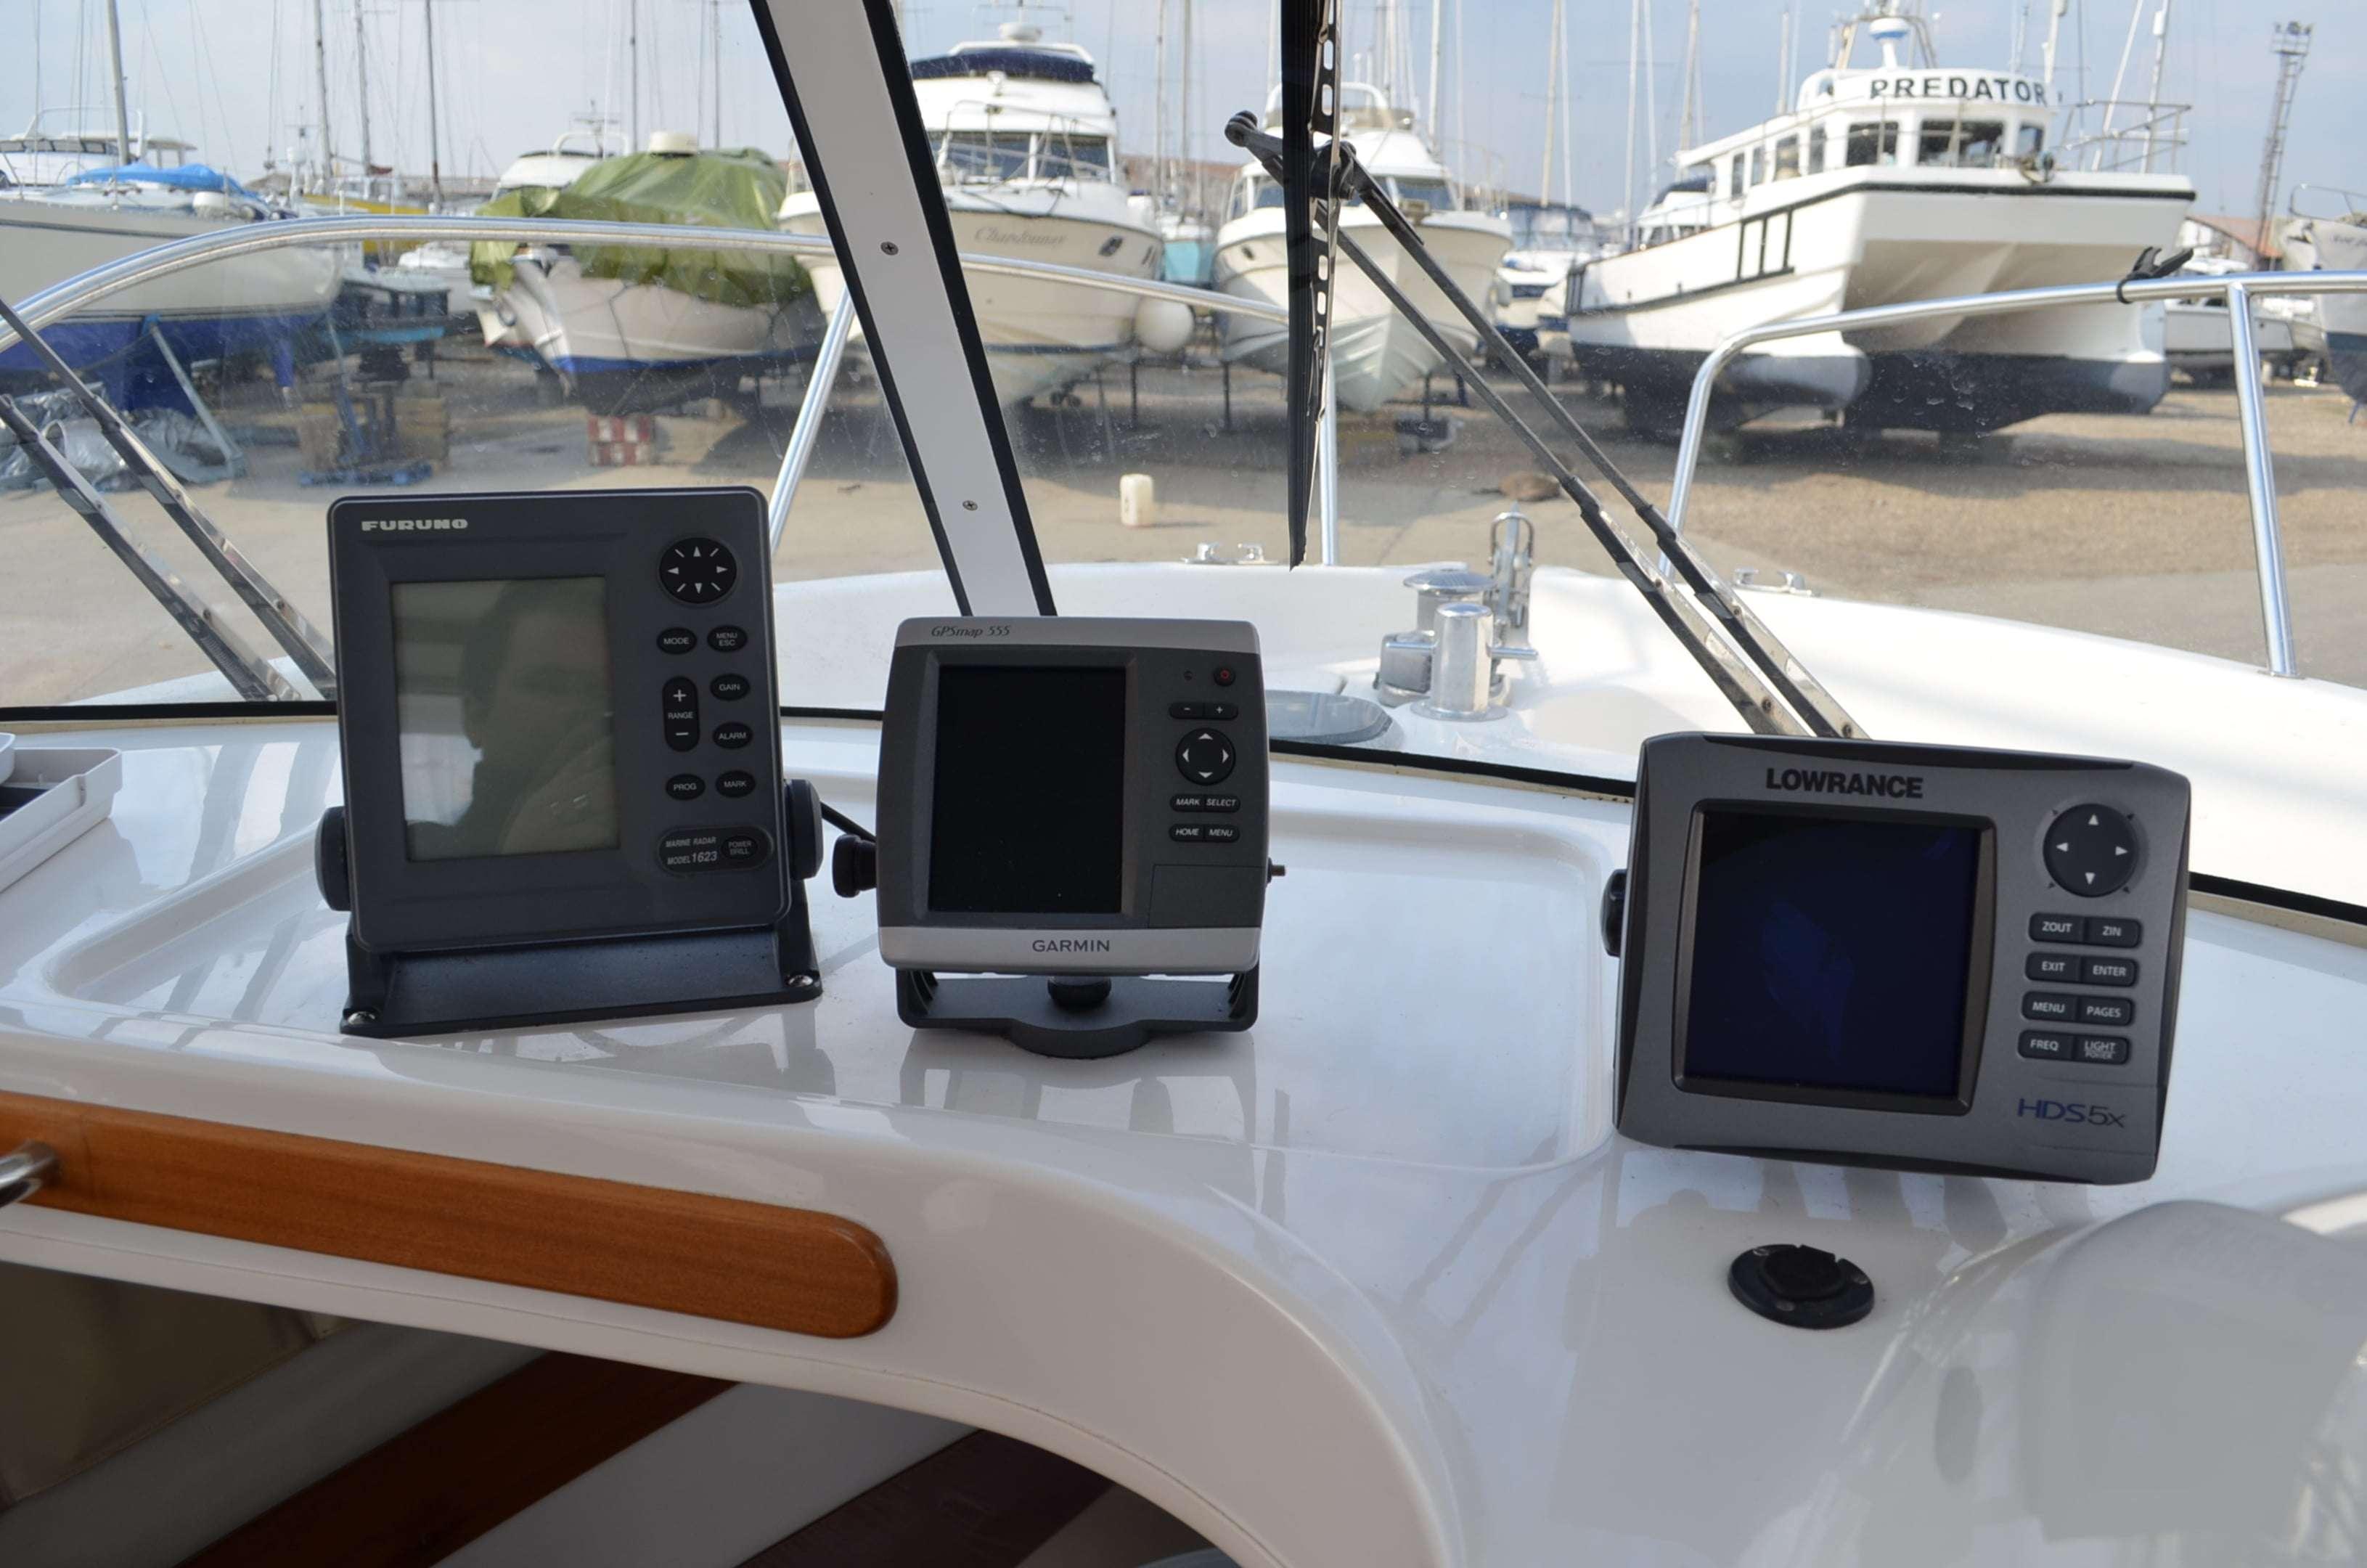 Sale Pending 2007 Arvor 250 As - Boats co uk